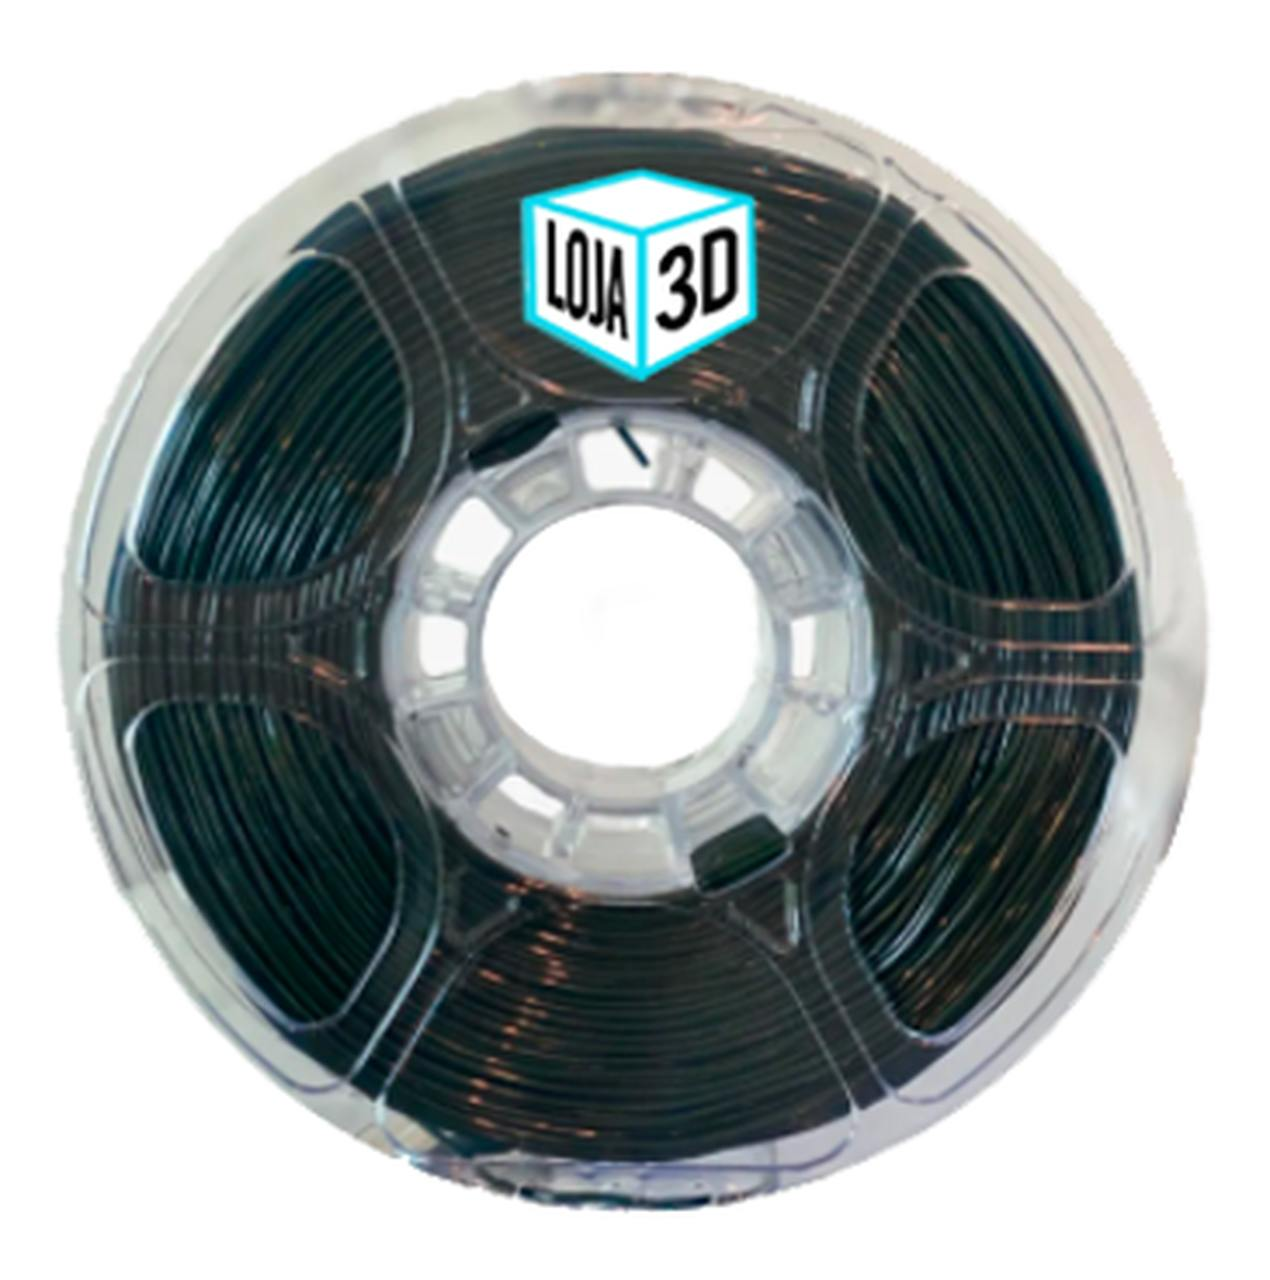 Filamento Flex TPU Premium - Verde Marinho - Furtacor - Loja 3D - 1.75mm - 1kg